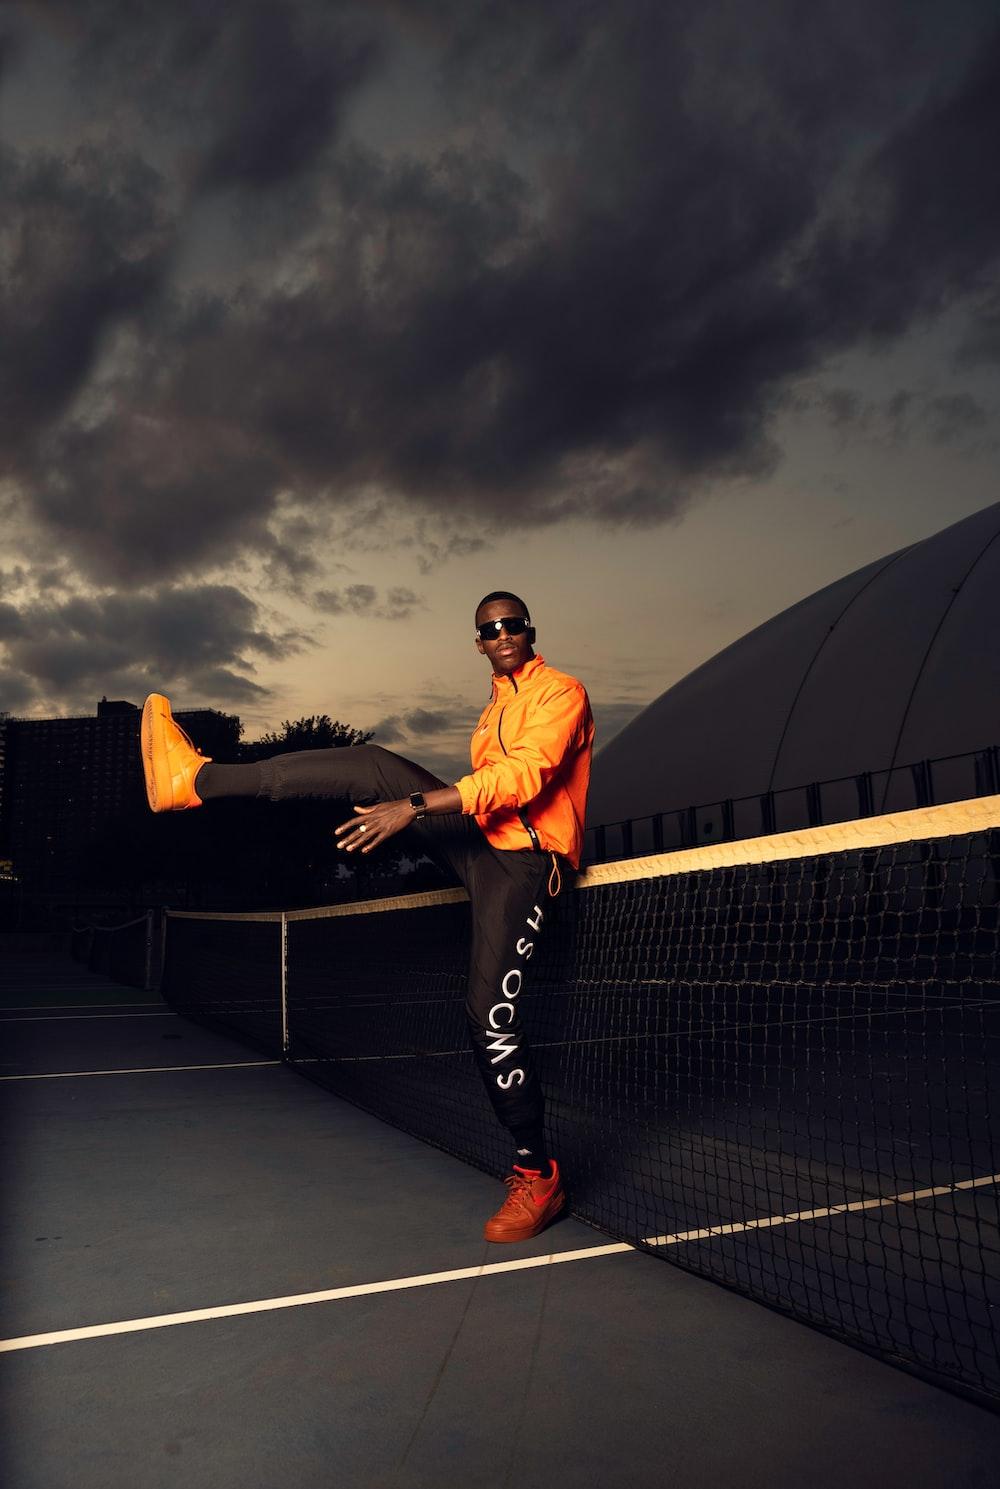 man in orange shirt and black pants standing on black bench